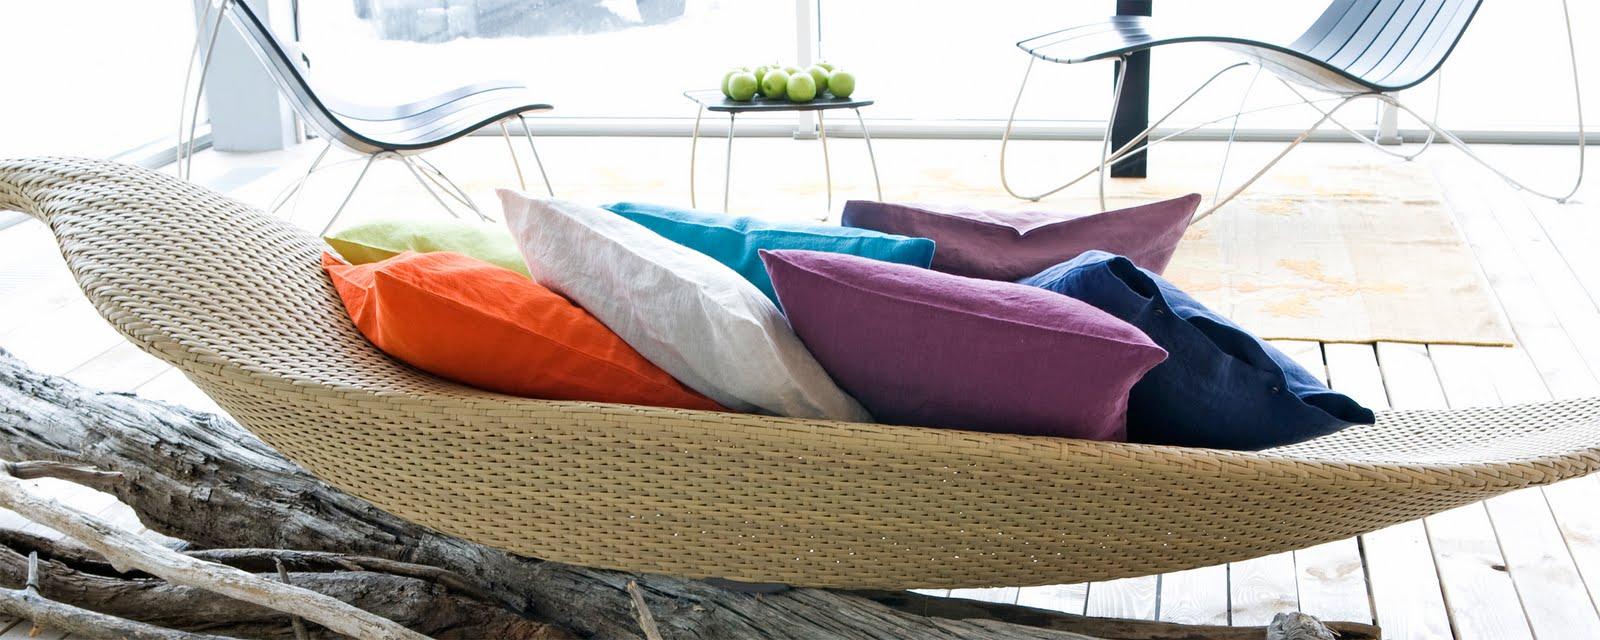 housse de couette boutons pression blog bazar. Black Bedroom Furniture Sets. Home Design Ideas